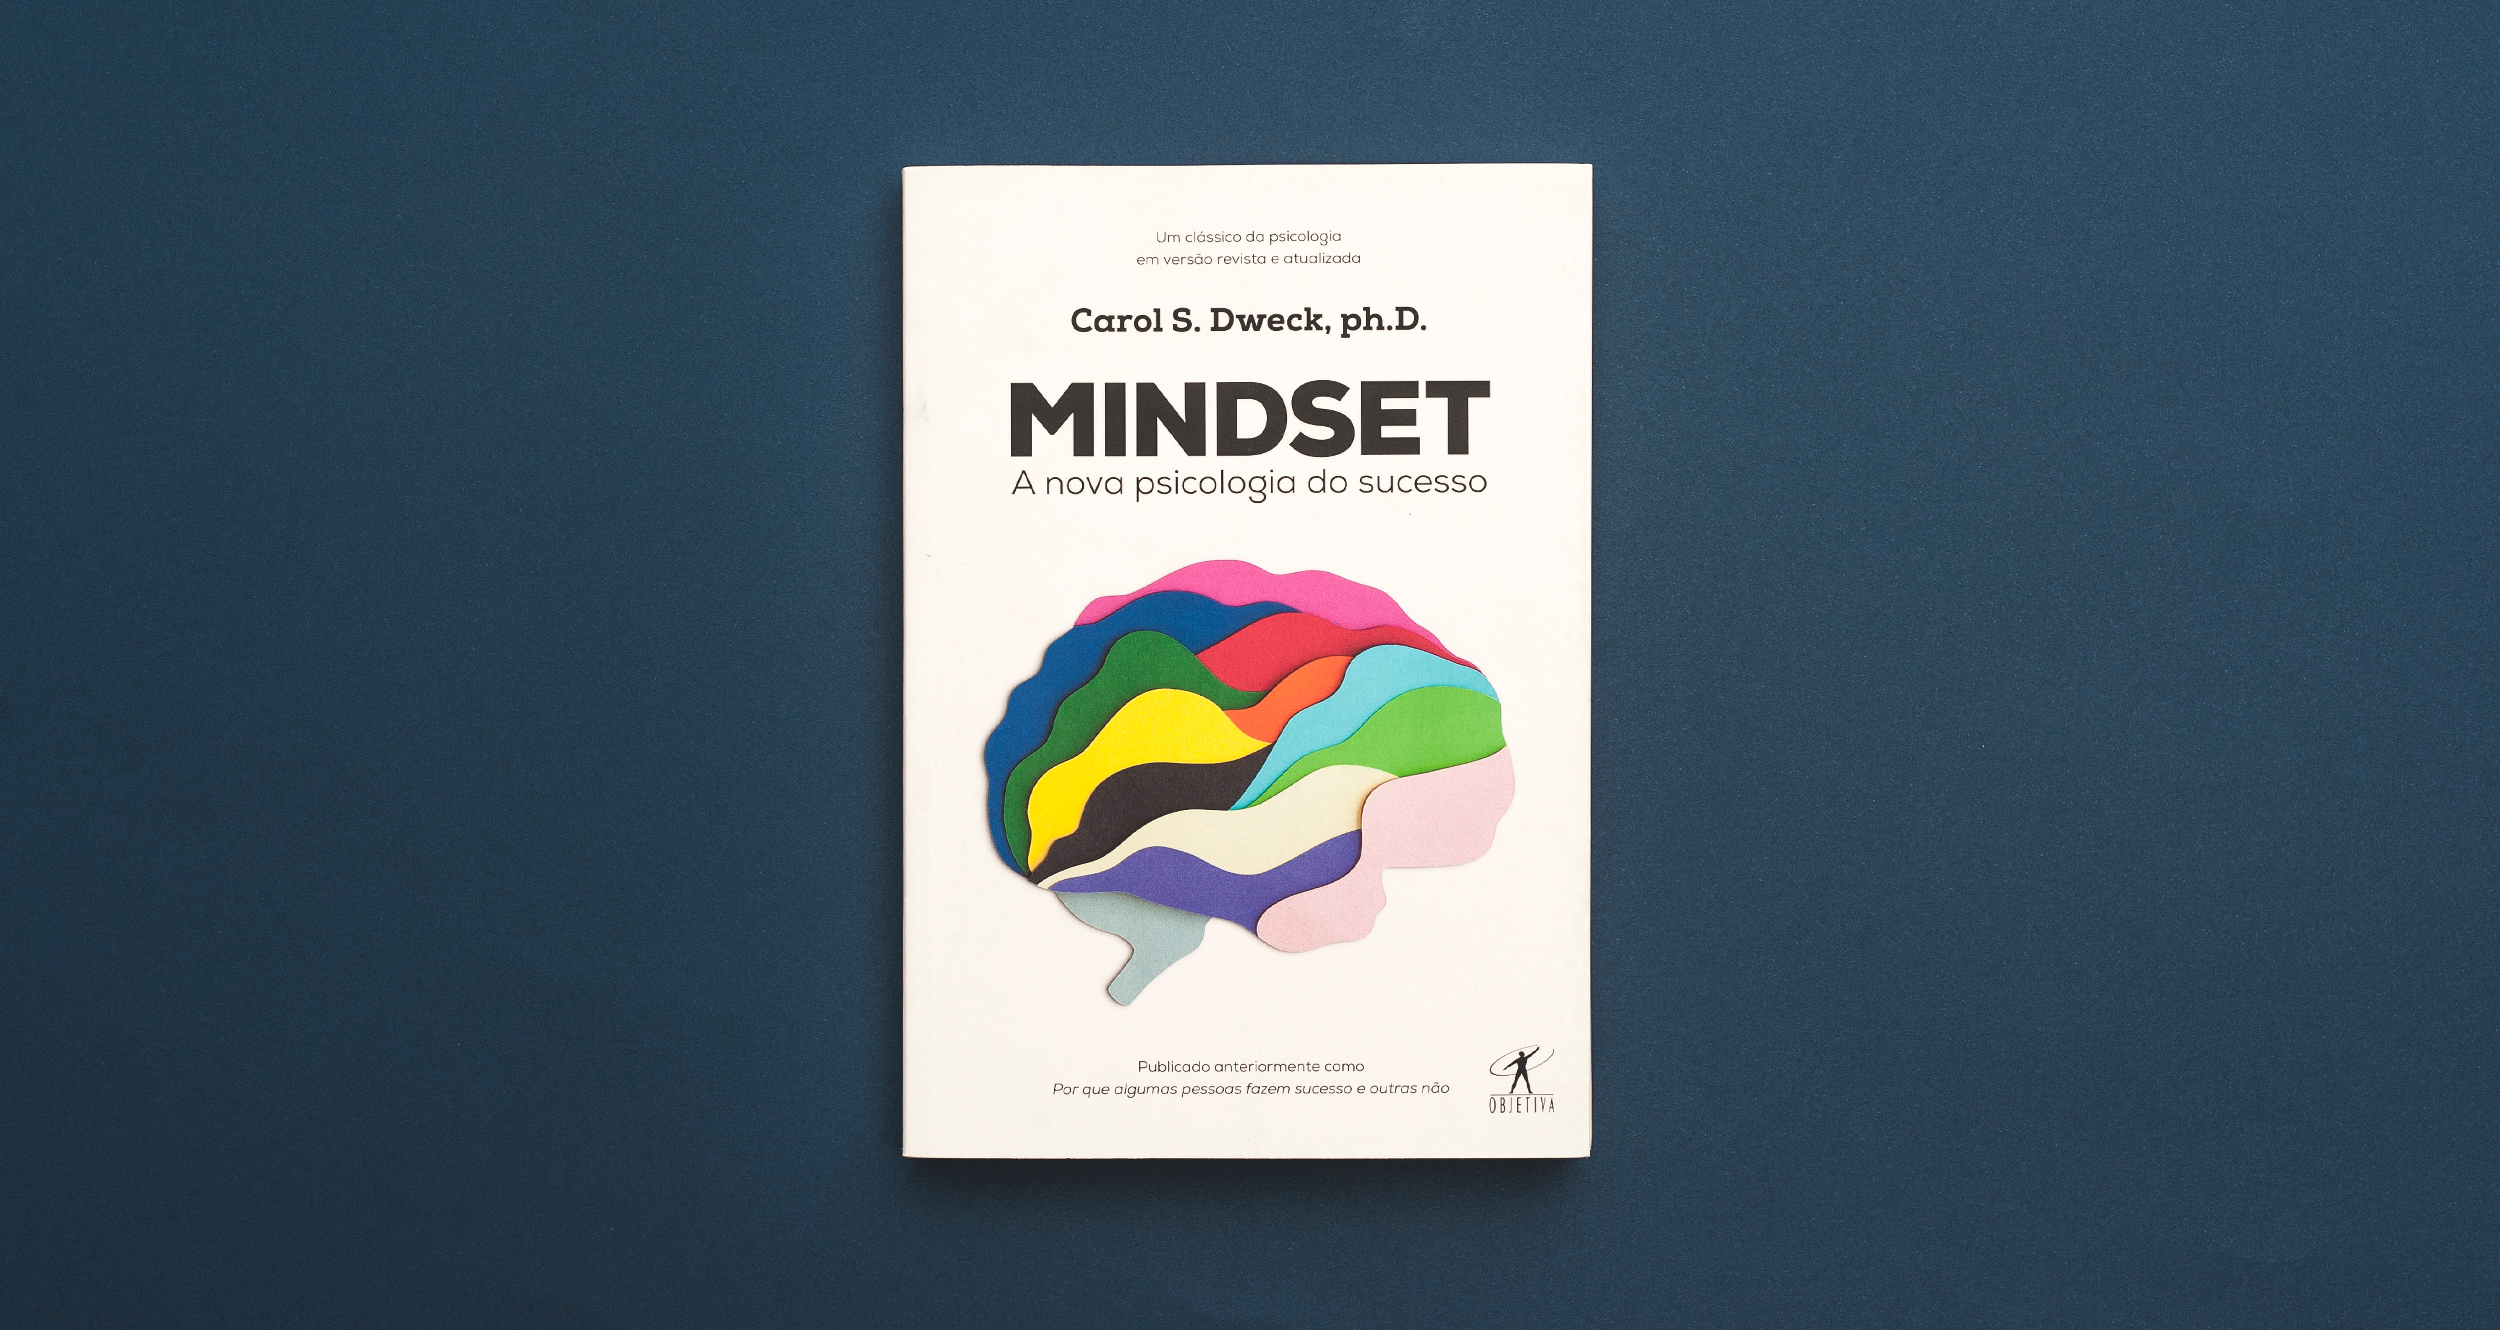 mindset_2.jpg